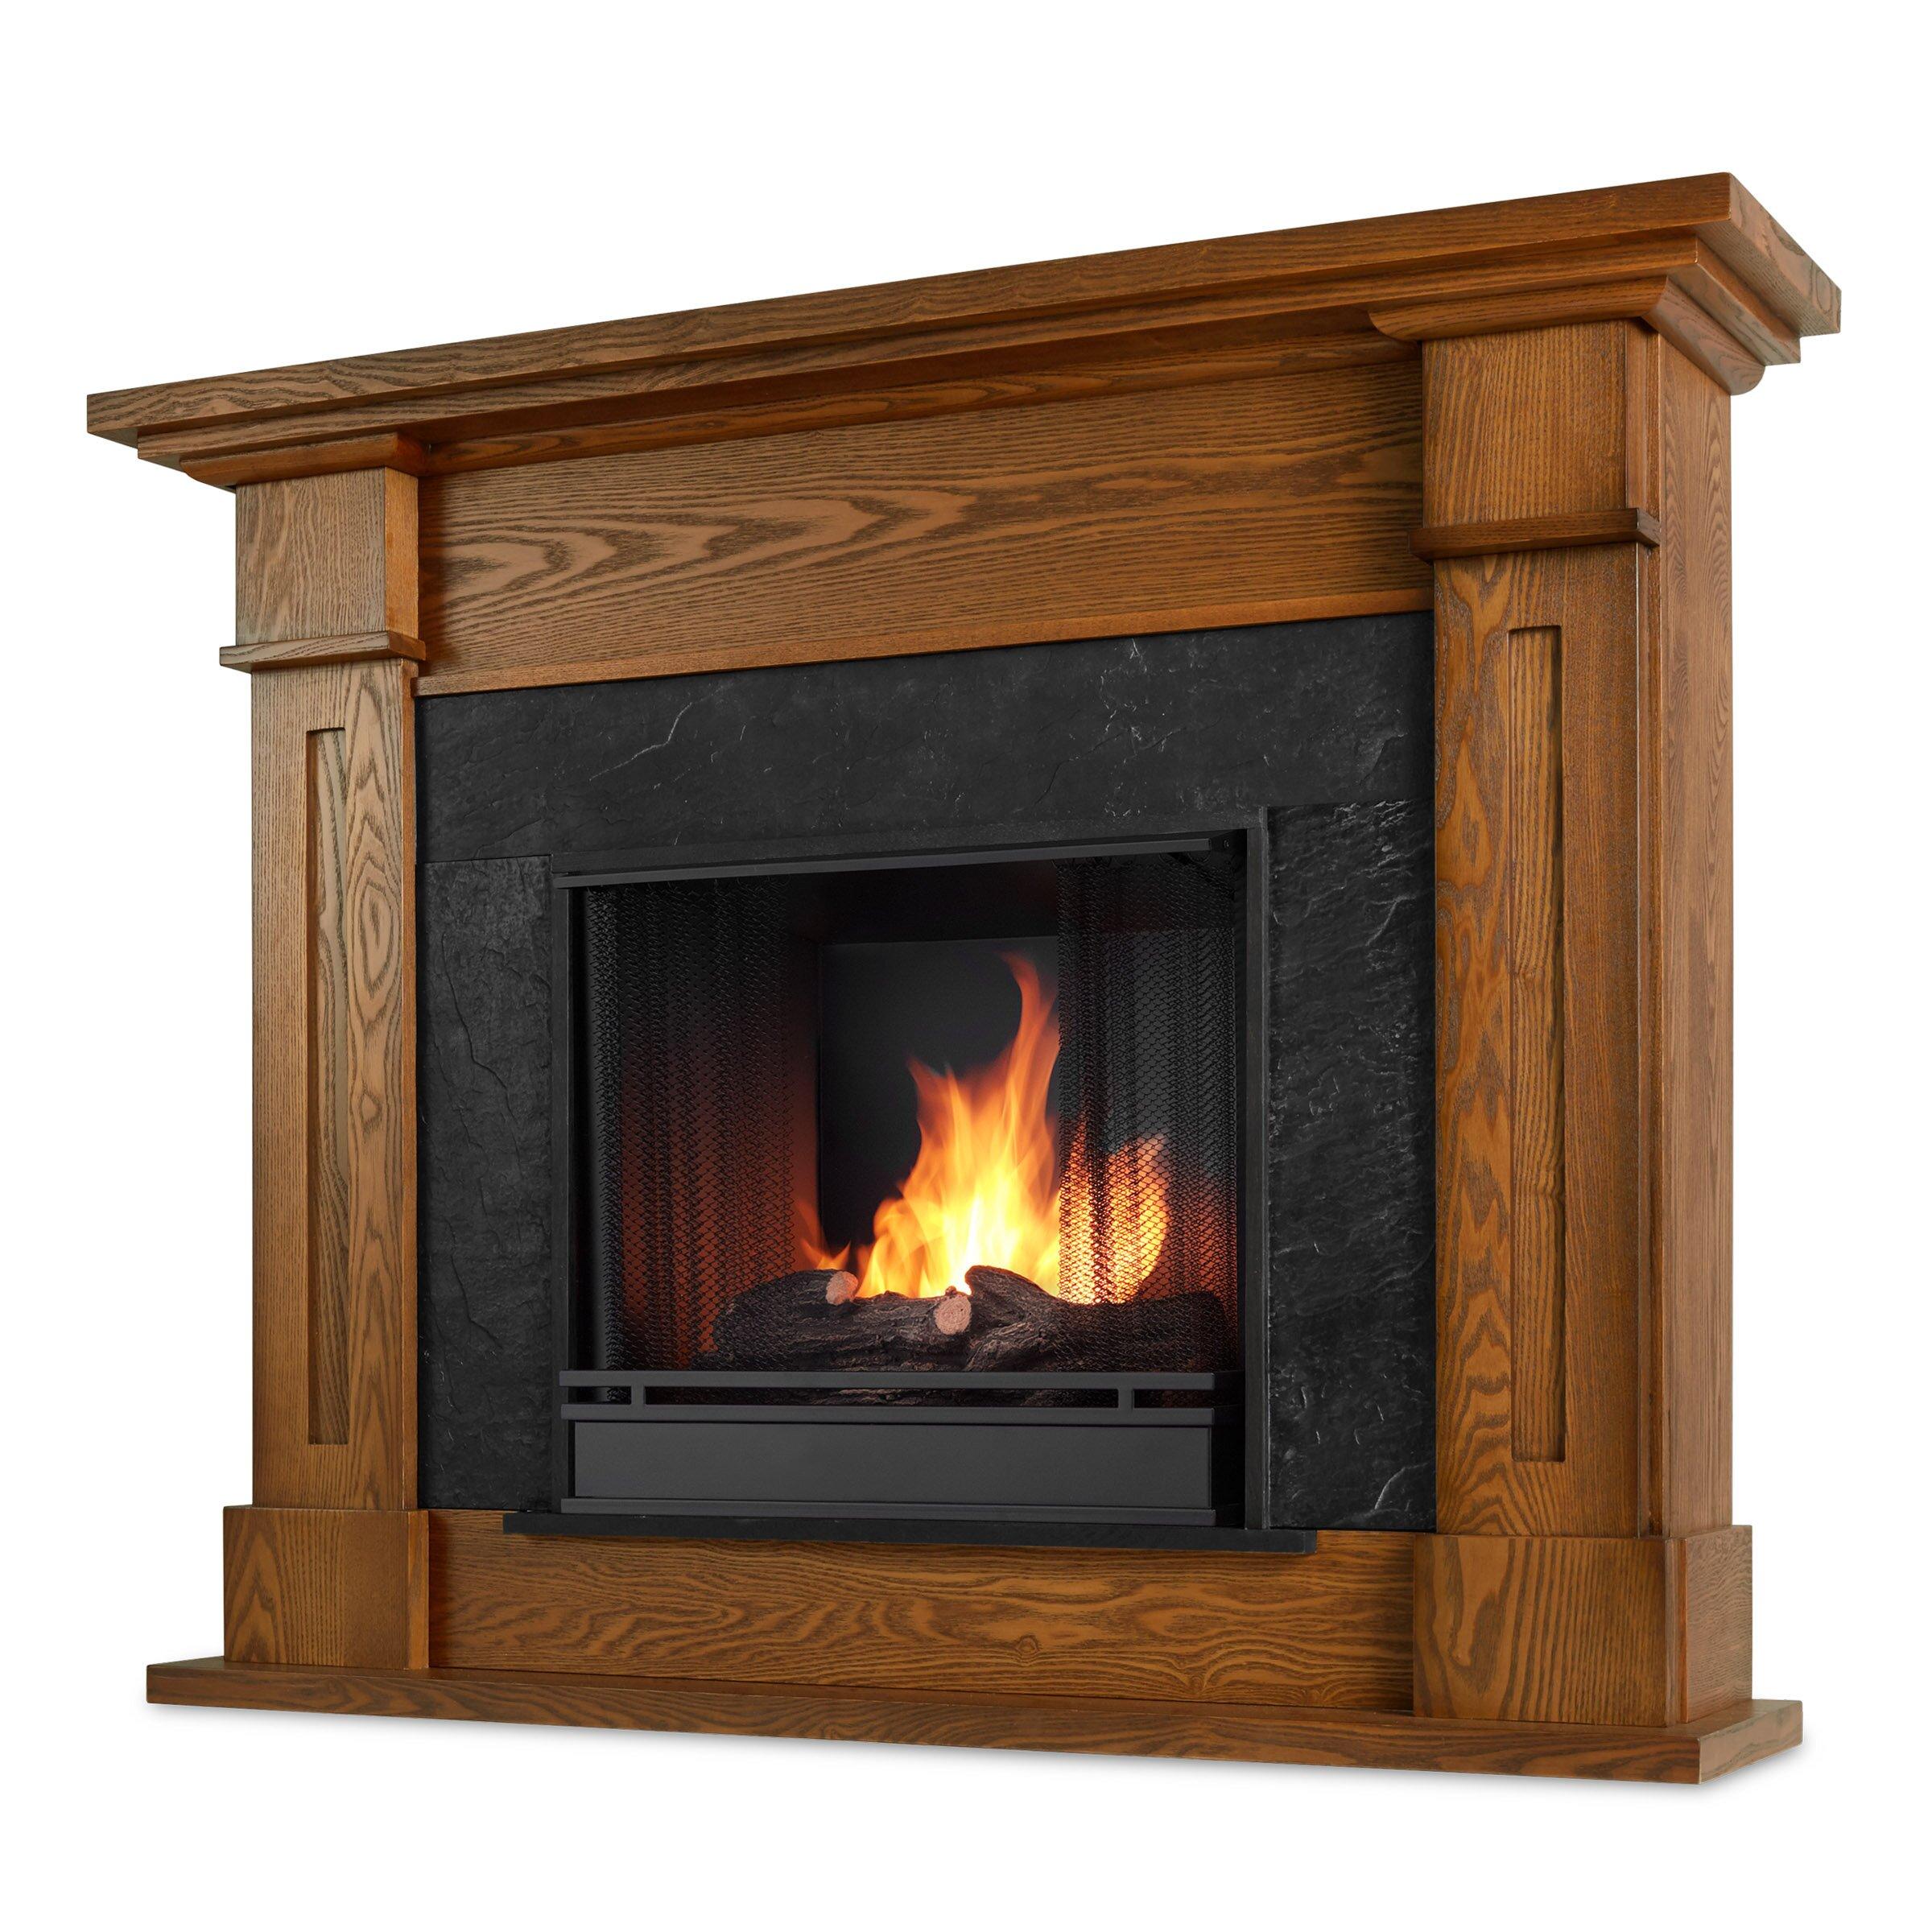 Real flame kipling gel fuel fireplace reviews wayfair for Wayfair gel fireplace